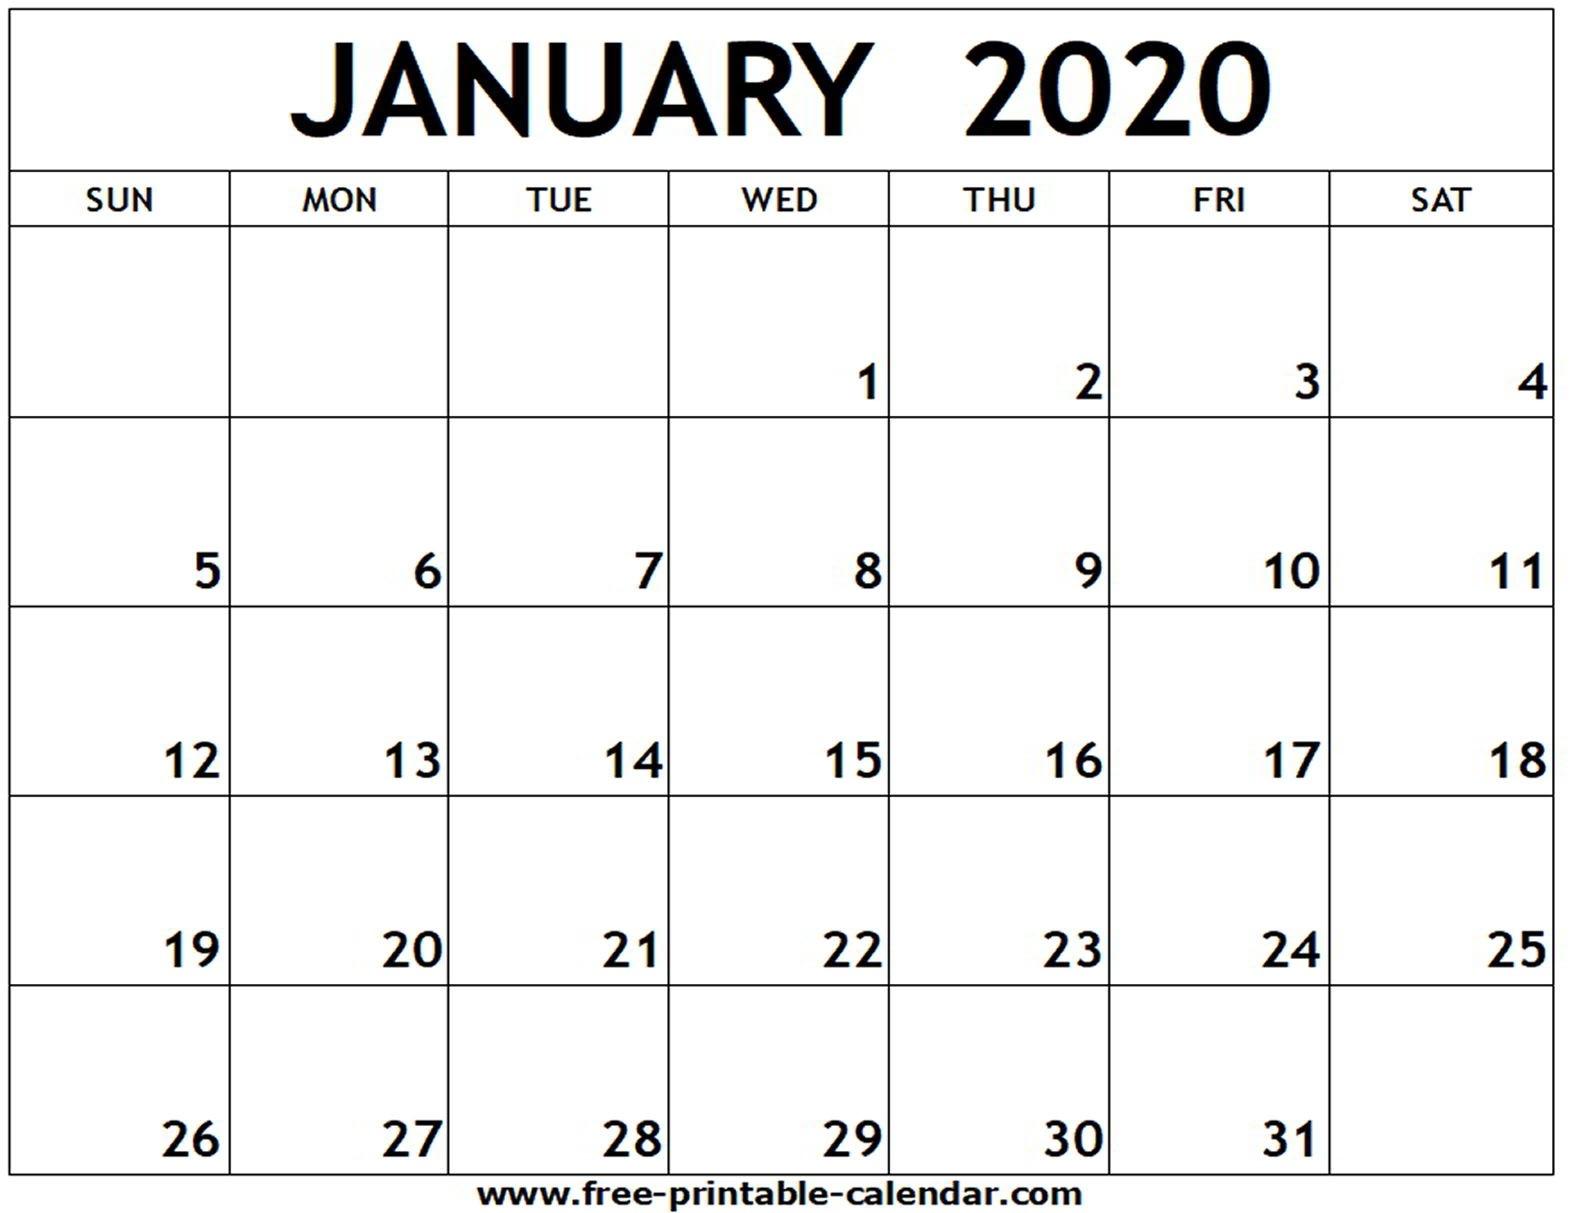 January 2020 Printable Calendar - Free-Printable-Calendar-January 2020 Calendar Events